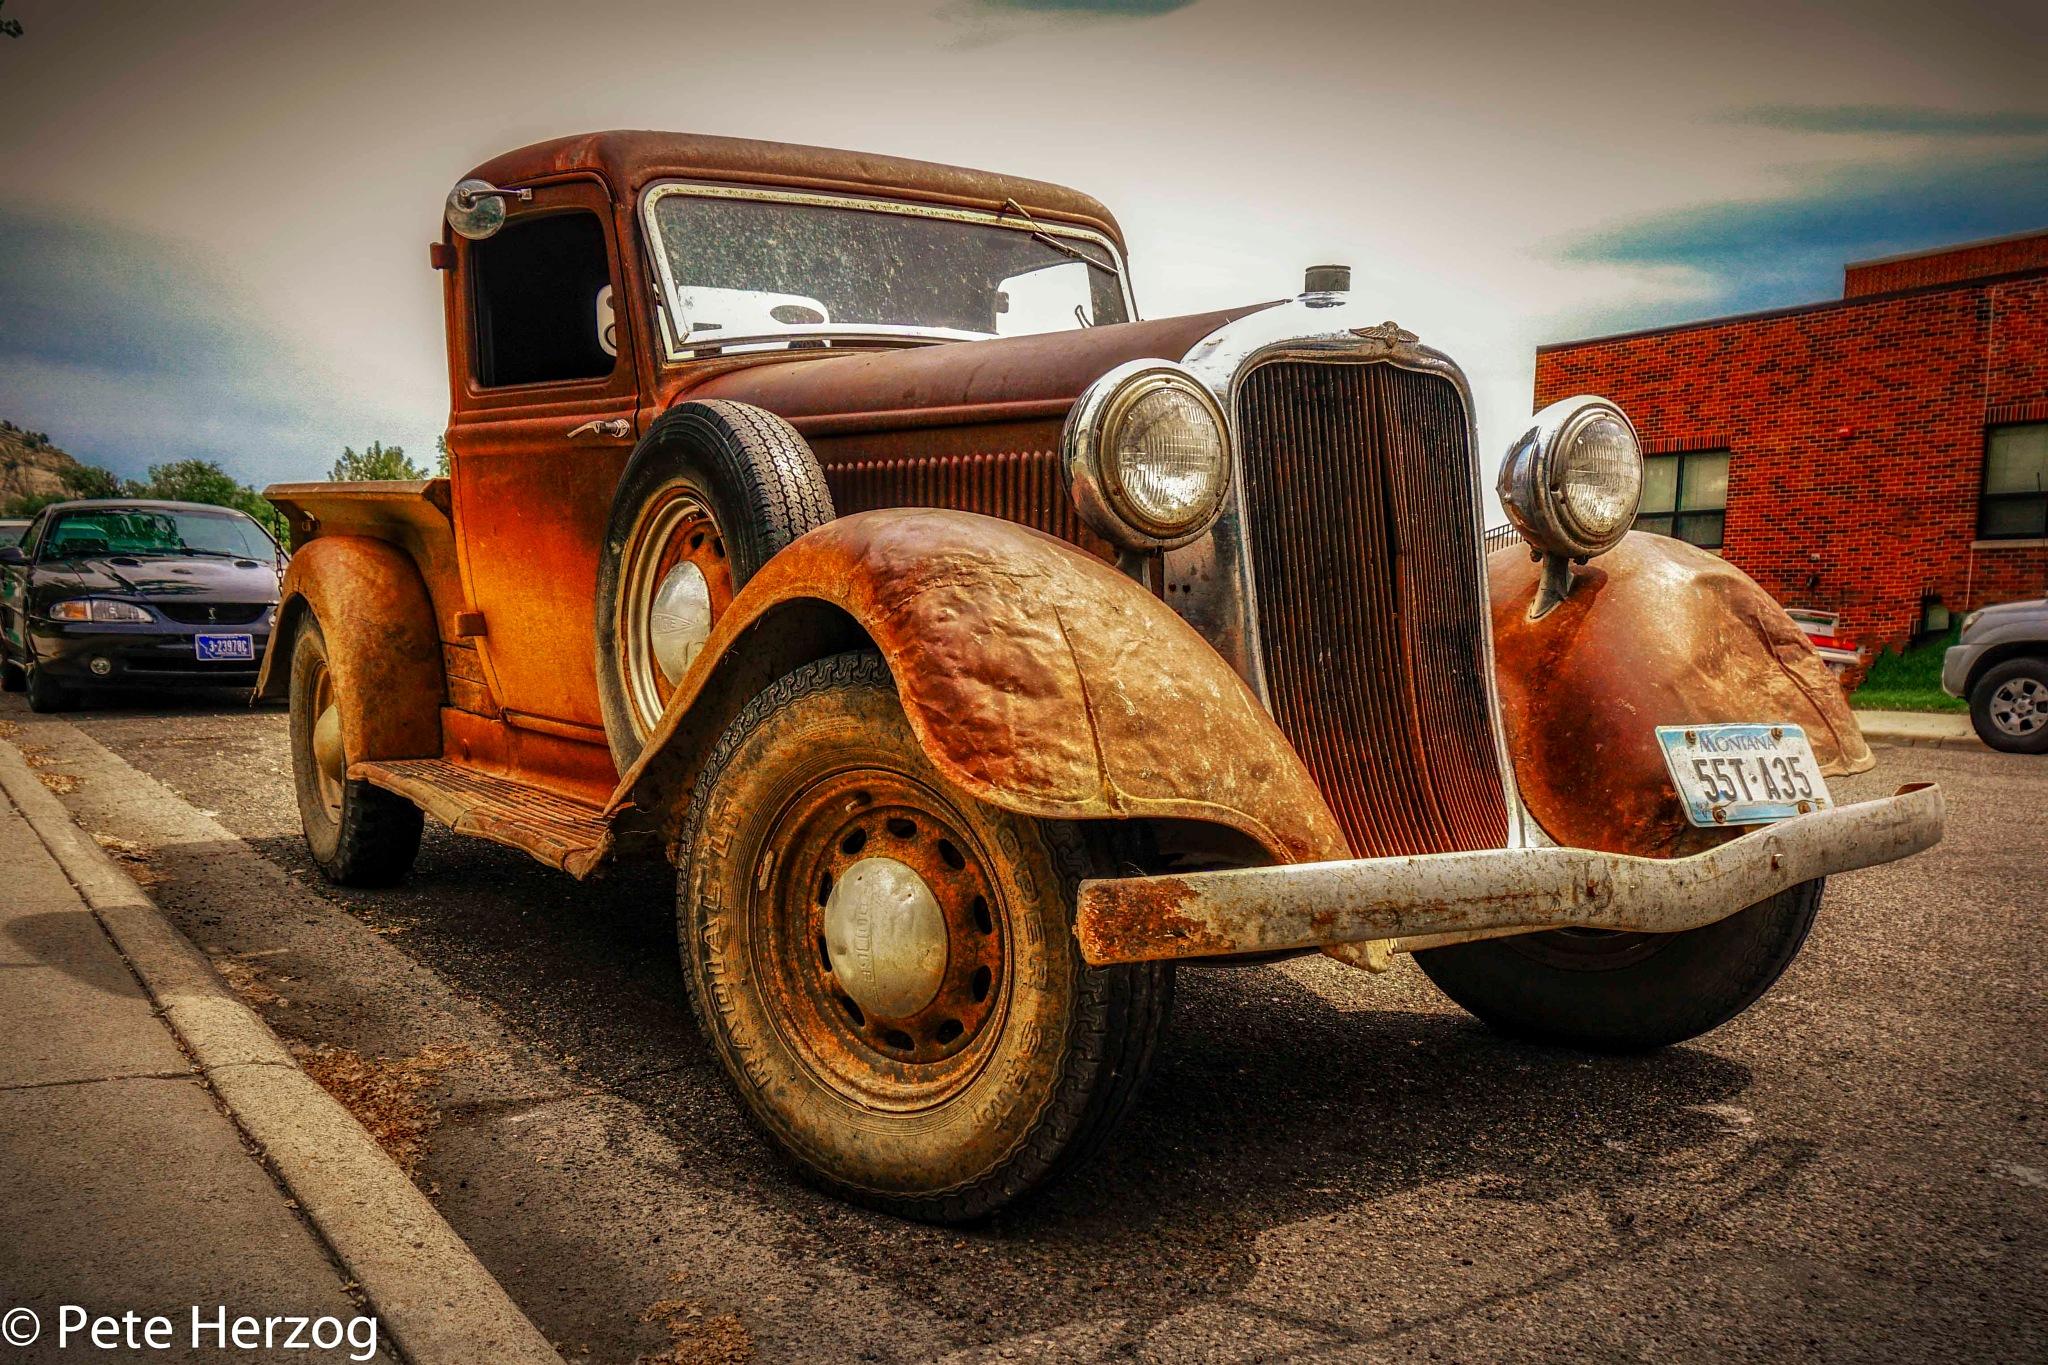 Vintage Truck by peter.herzog.3323